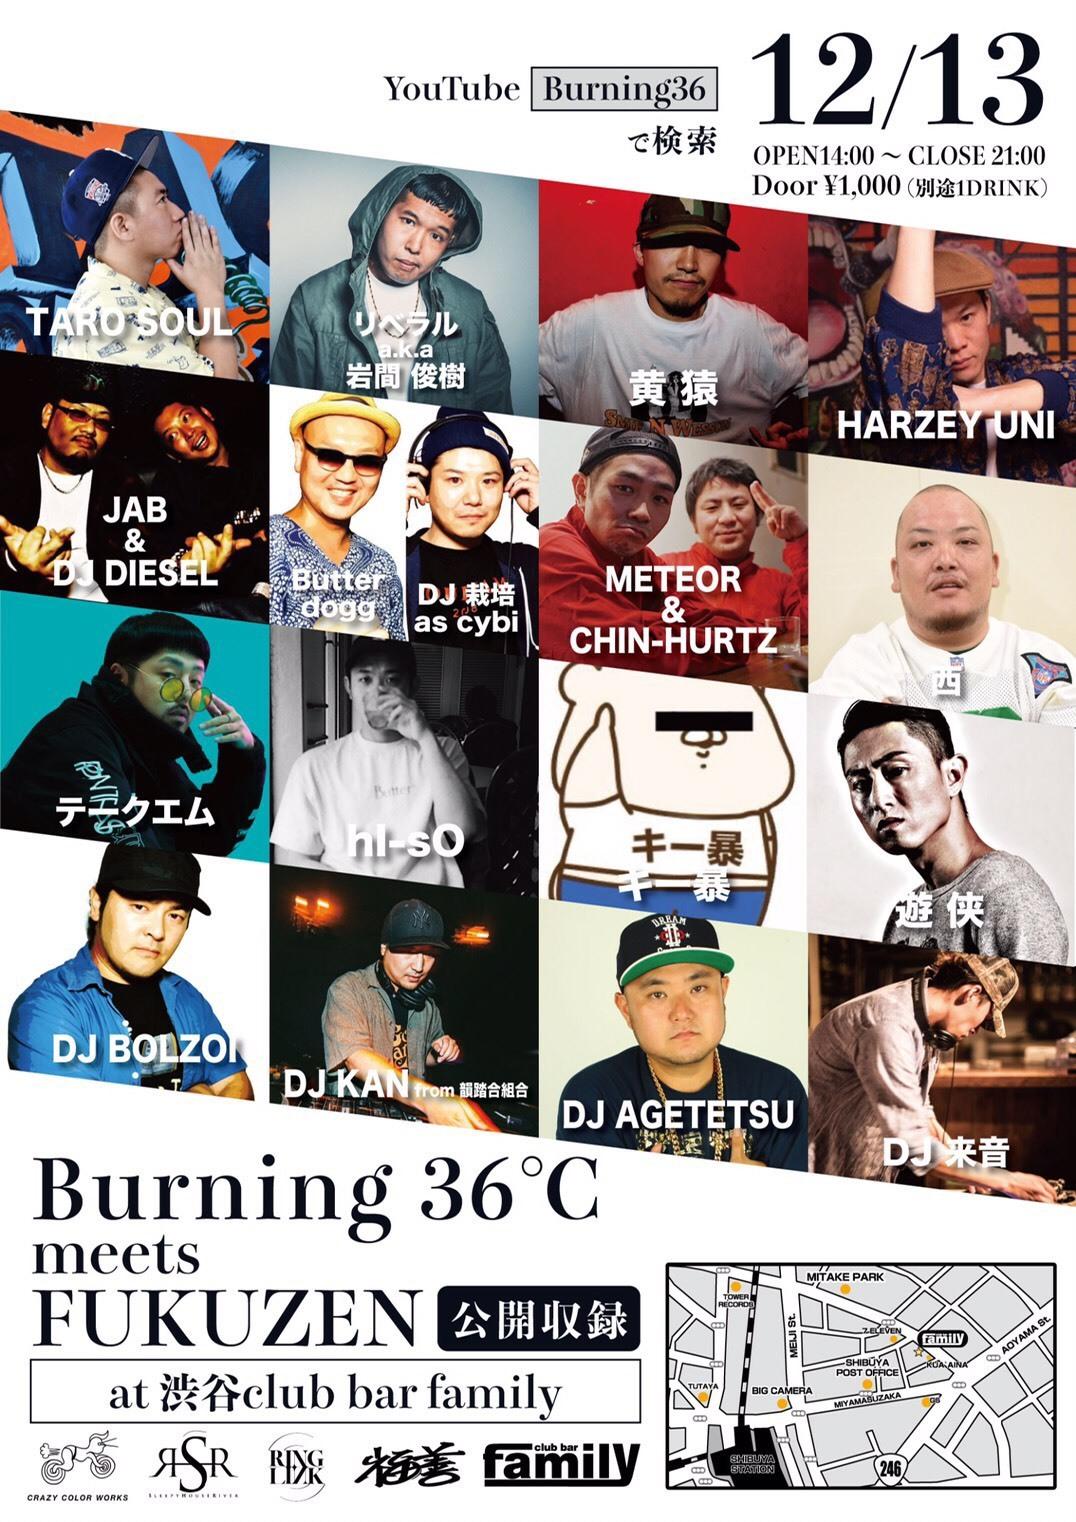 20/12/13(sun) Burning 36℃ meets FUKUZEN @ 渋谷family_a0262614_23301953.jpg